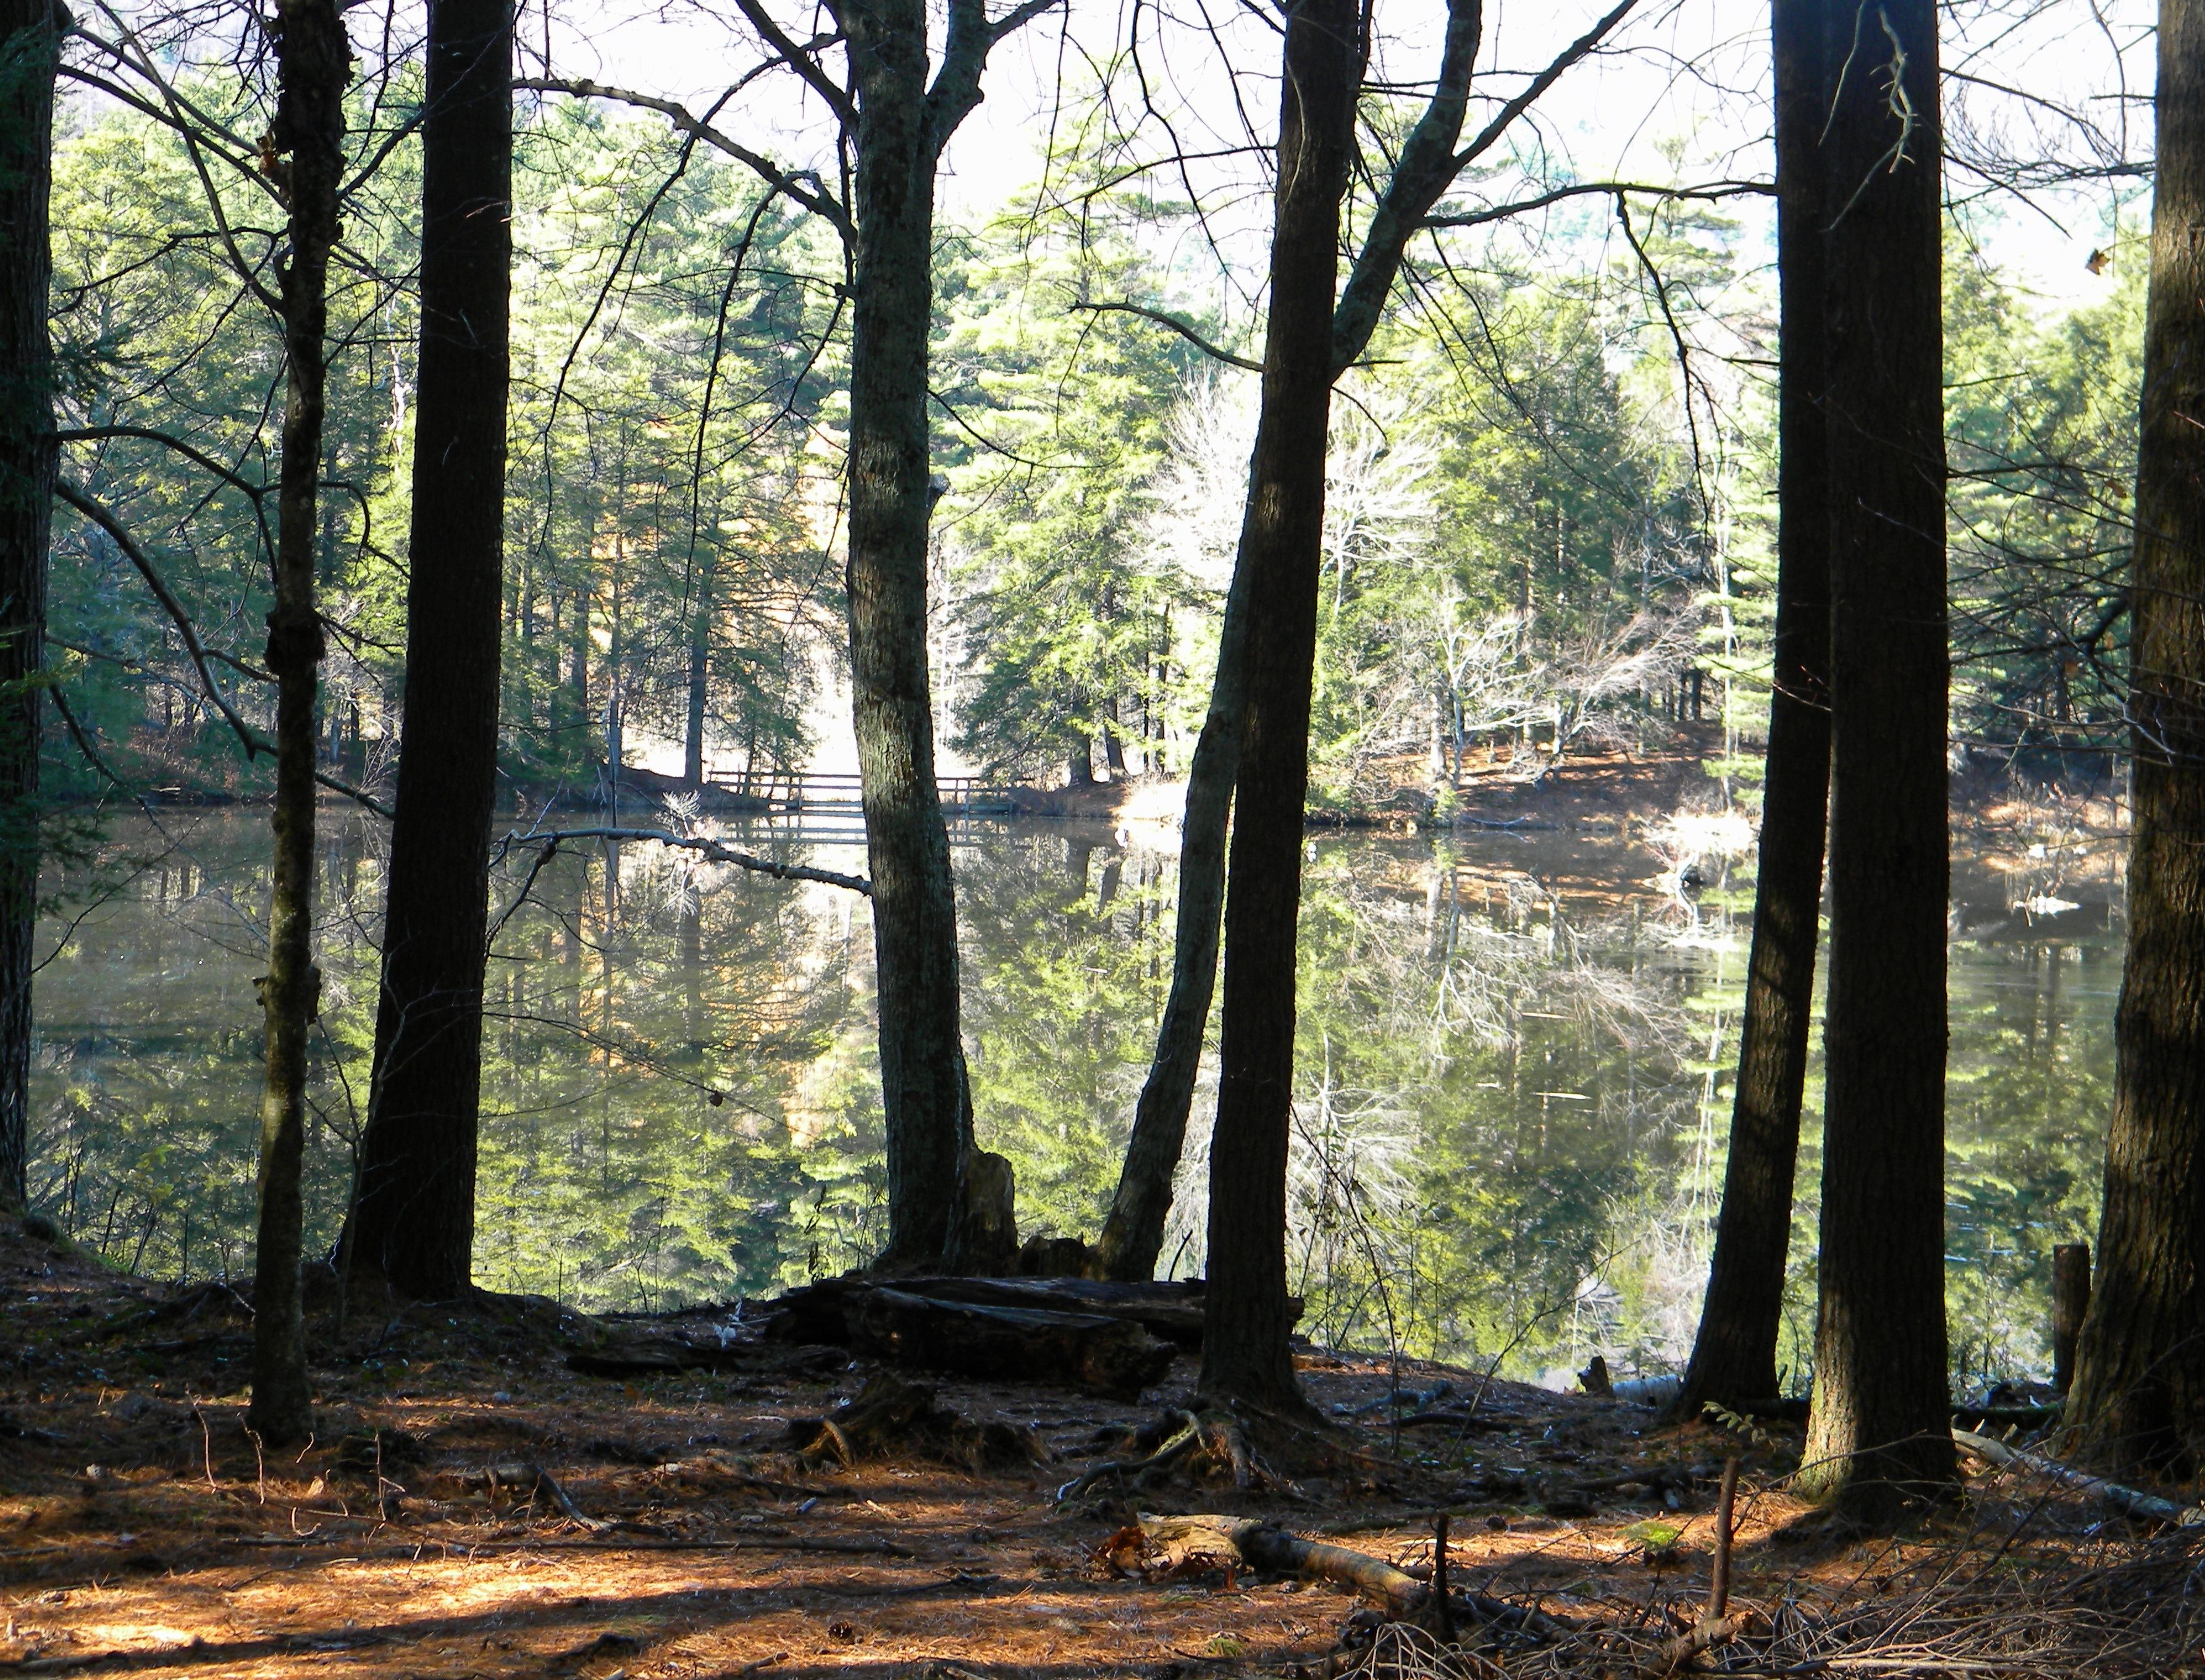 Photo of shaftsbury lake vermont by sue freebern